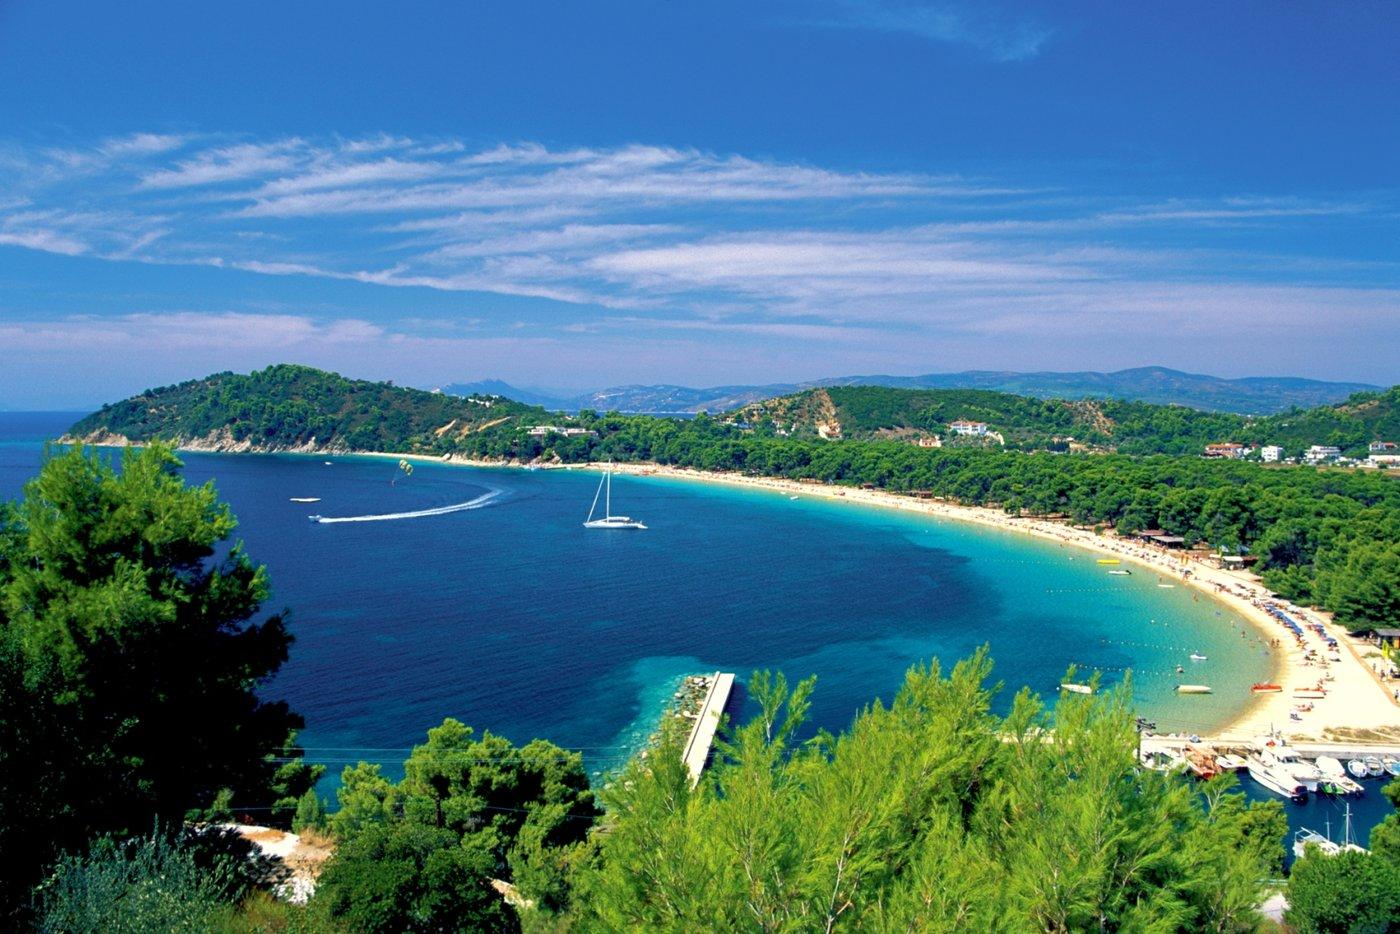 Views from Hydra's hilltop Profítis Ilías in Greece